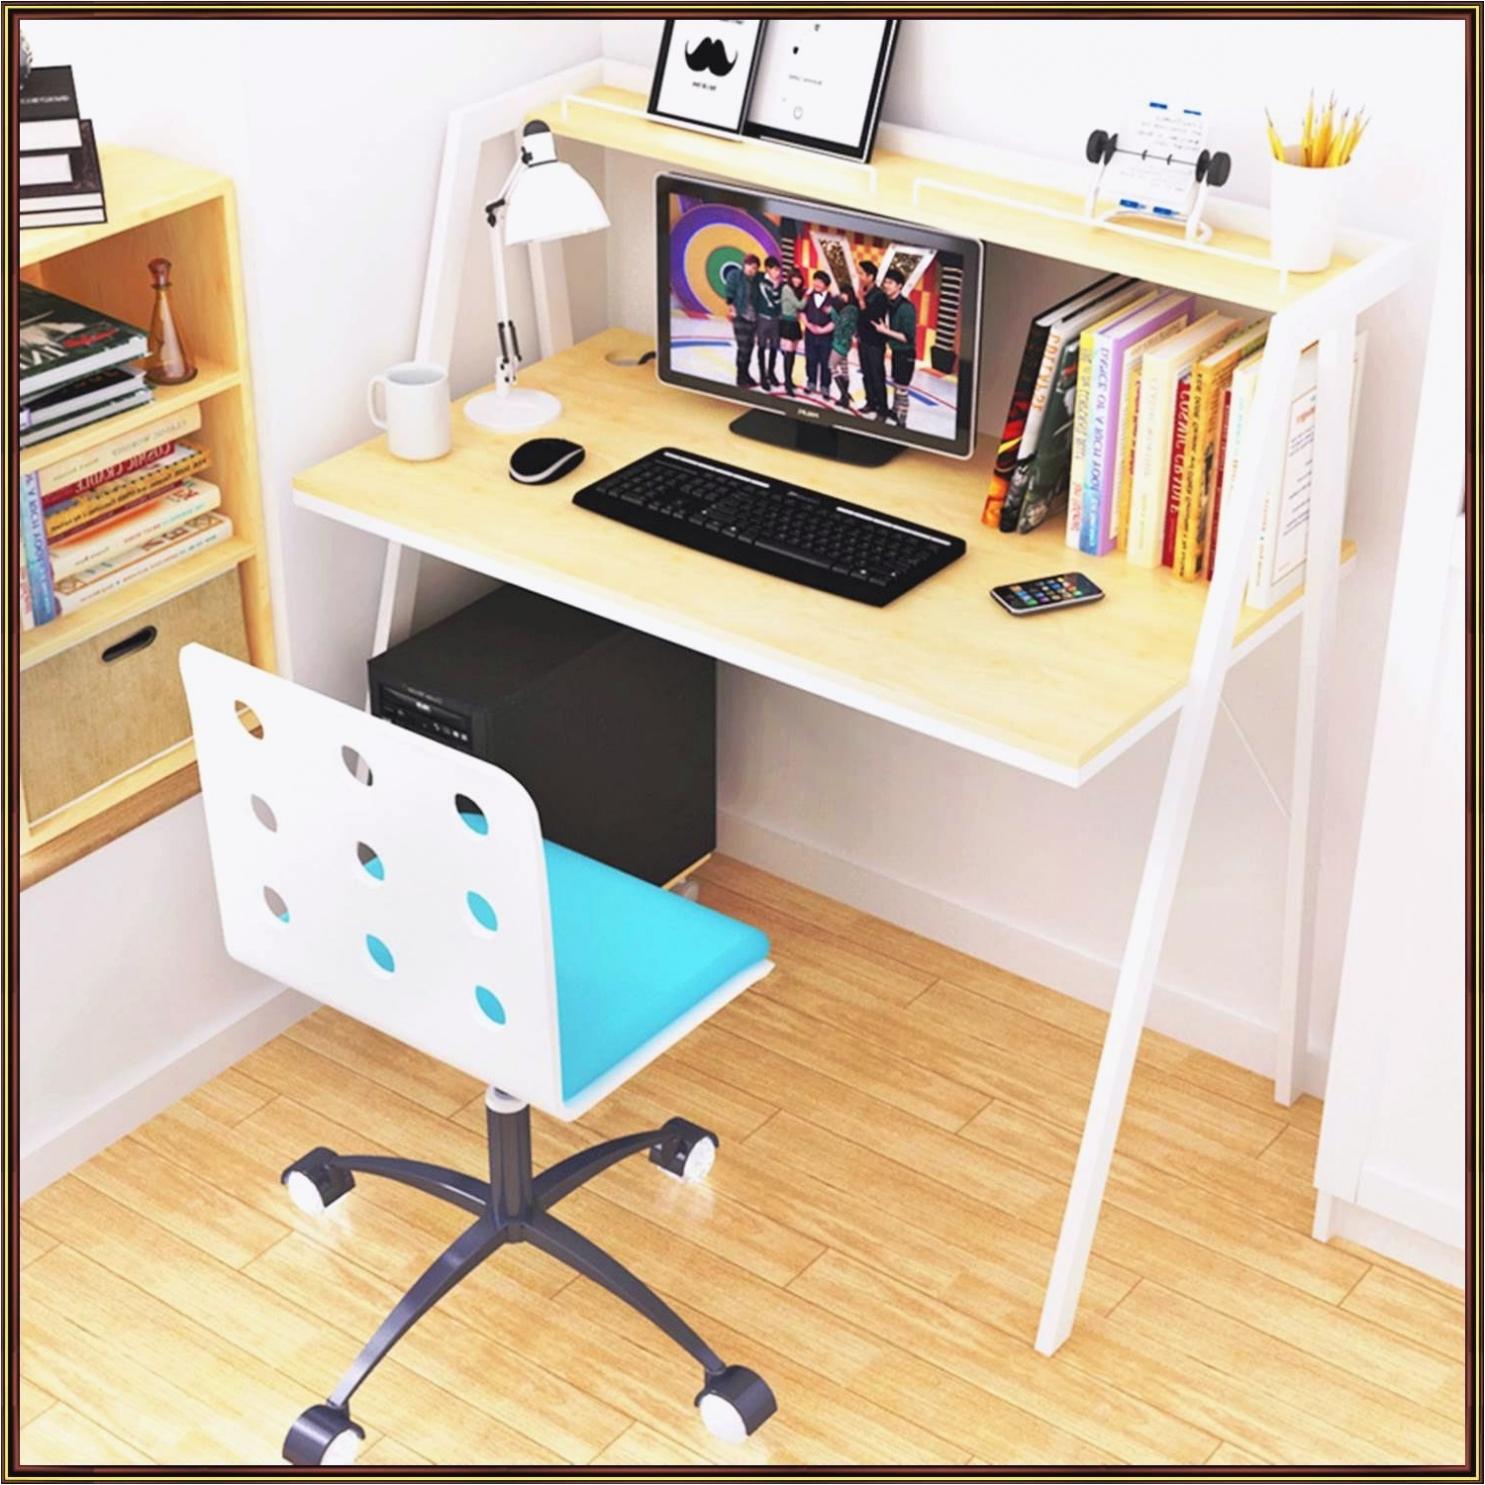 Ikea Muebles De Oficina 3ldq Mesas De Icina Ikea Bogotaeslacumbre Inicio Muebles Oficina